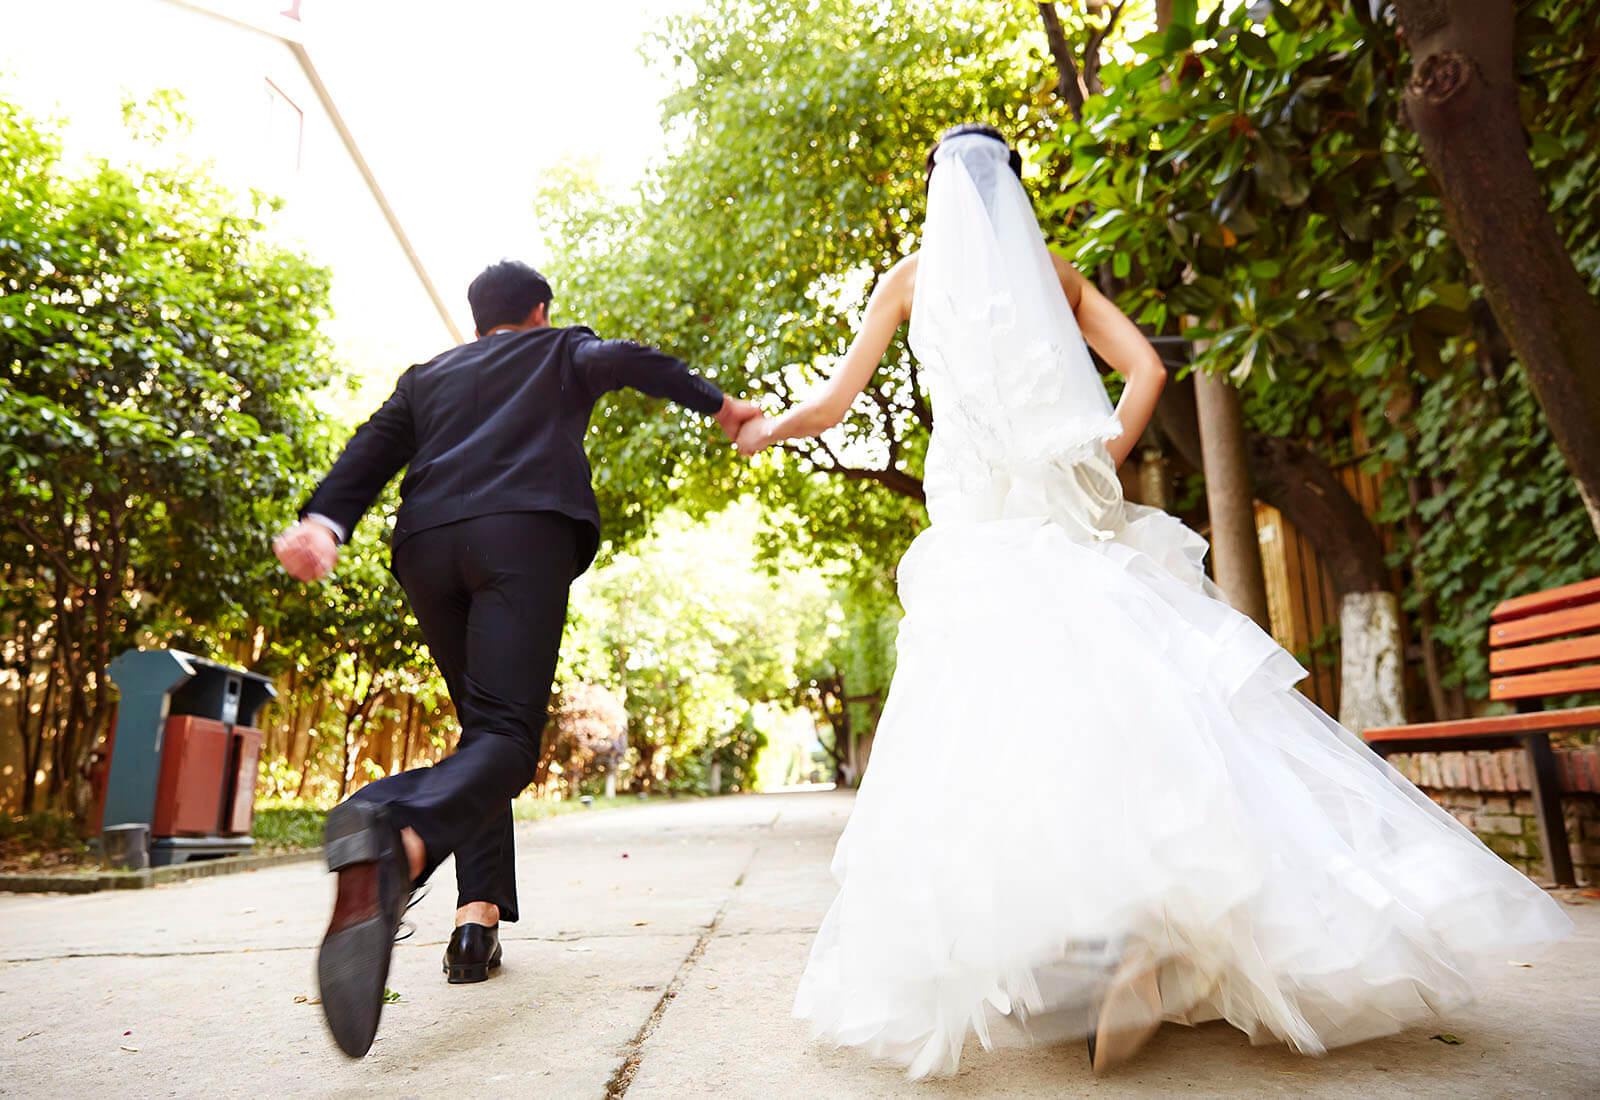 Expert Tips on Planning a Last-Minute Wedding | LoveToKnow